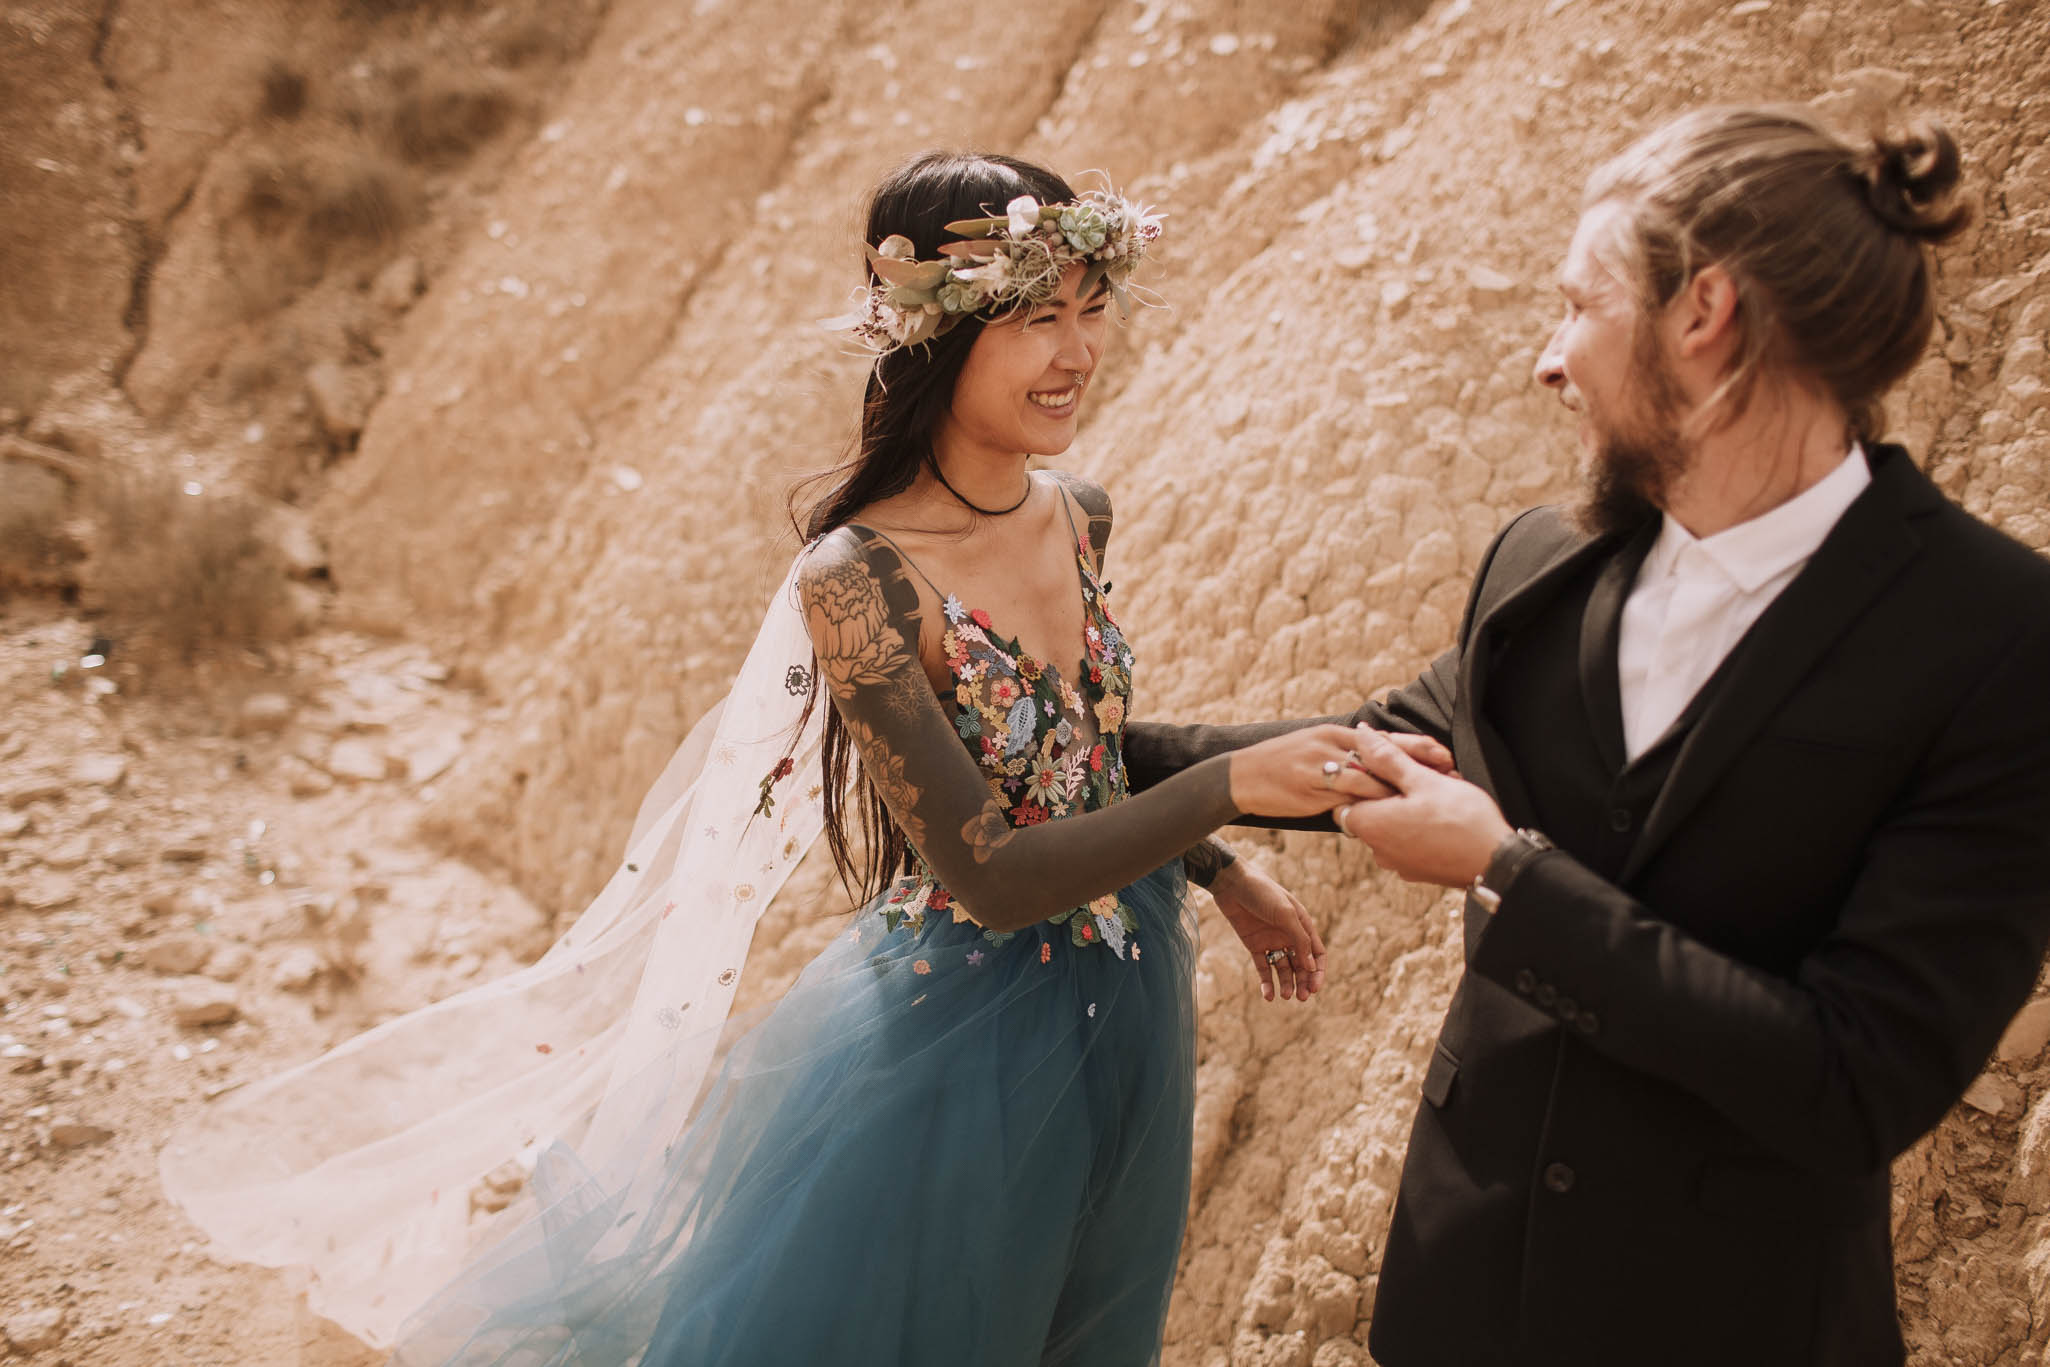 Spain-wedding-photographer-bardenas-reales-jeremy-boyer-photographe-mariage-bordeaux-floral-wedding-dress-robe-78.jpg